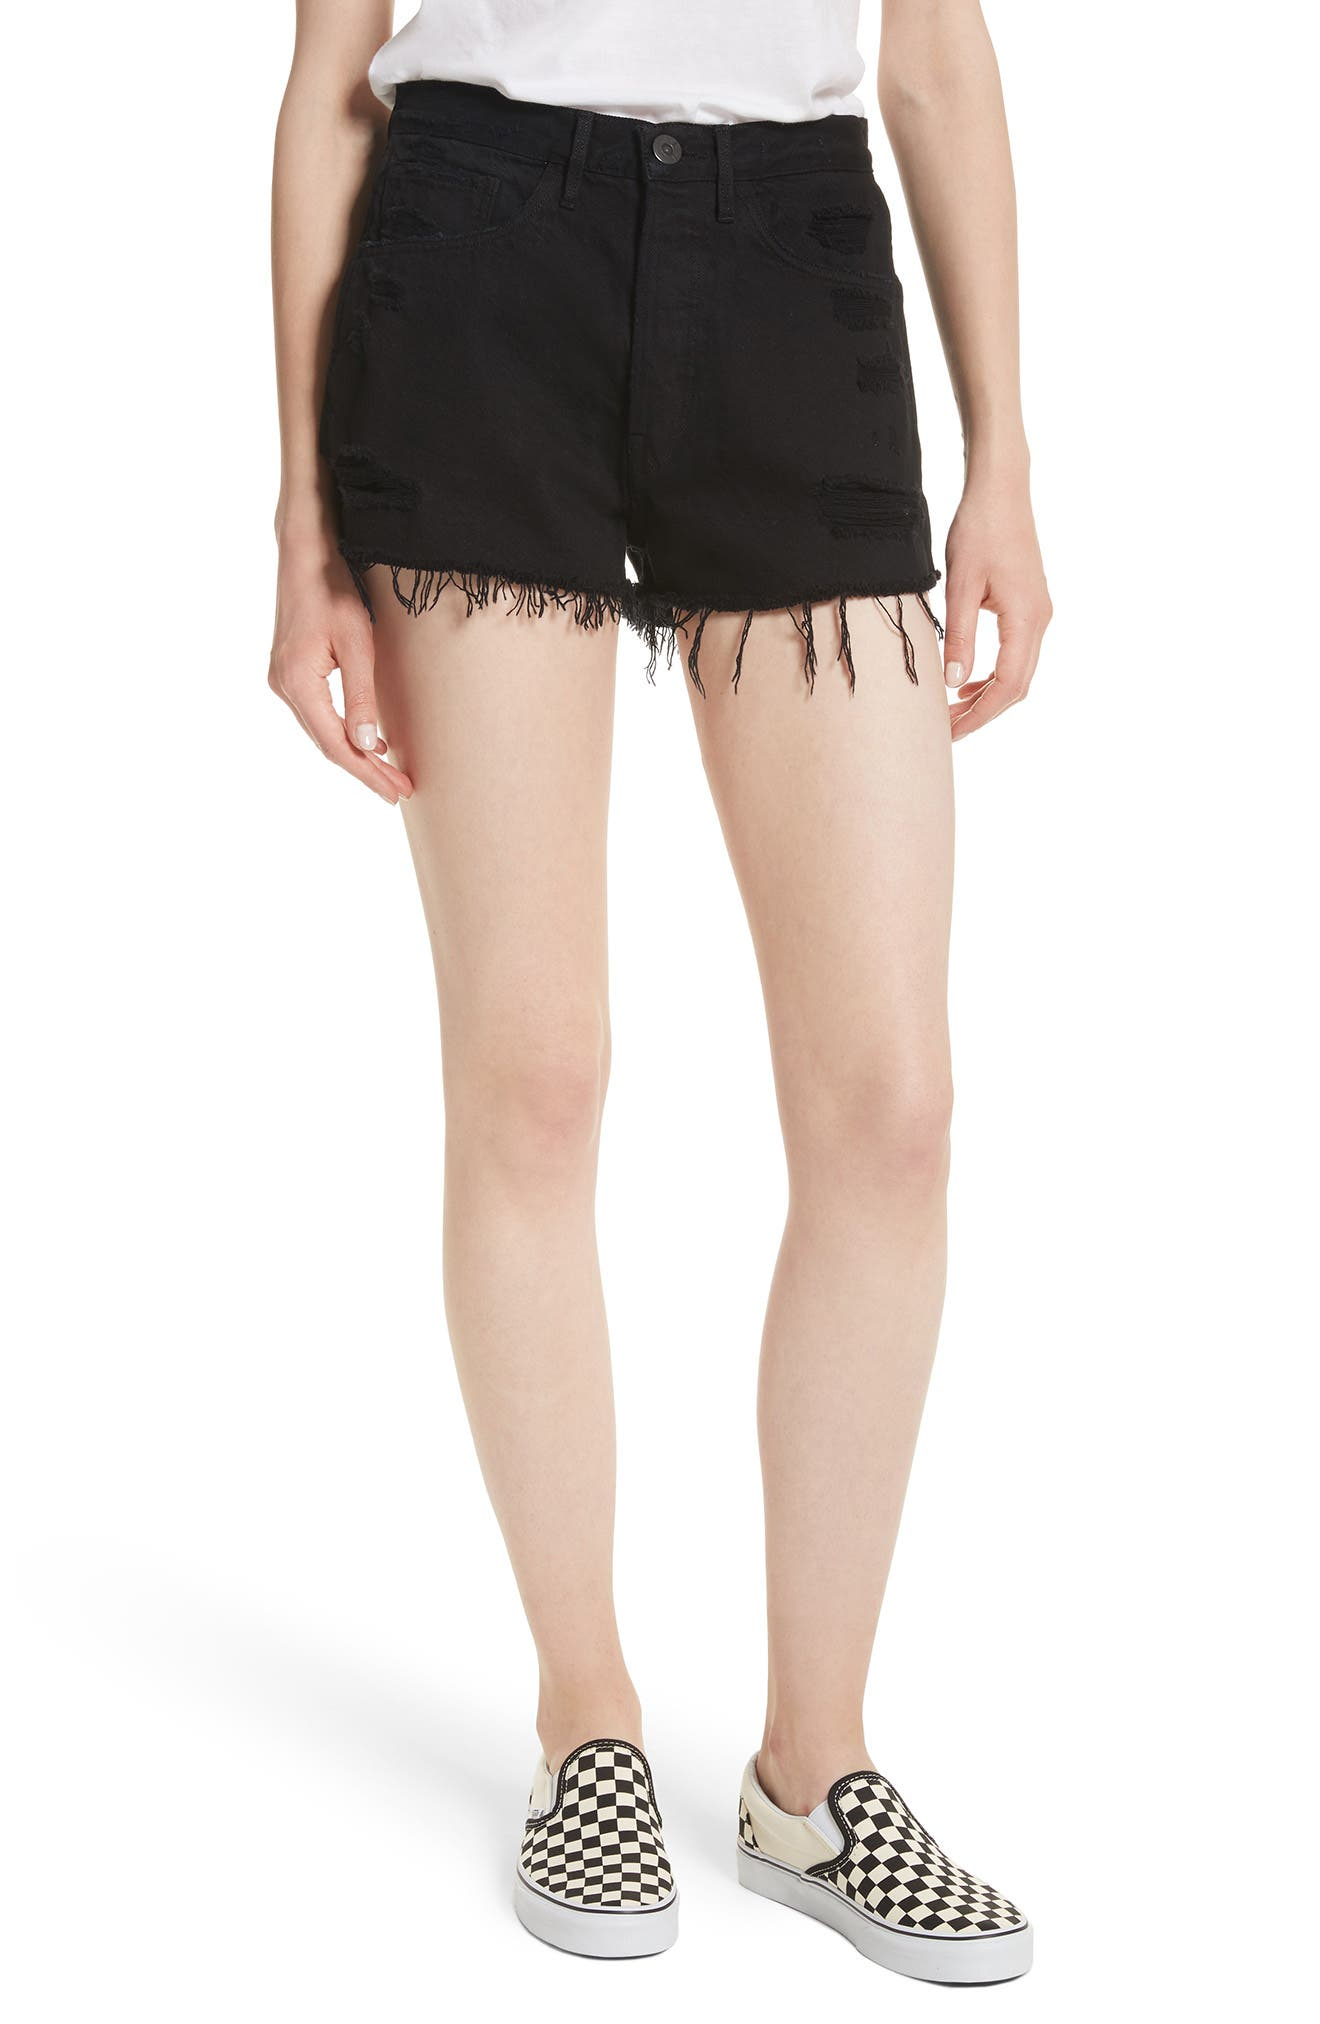 W4 Carter Ripped High Waist Denim Shorts,                         Main,                         color, 002